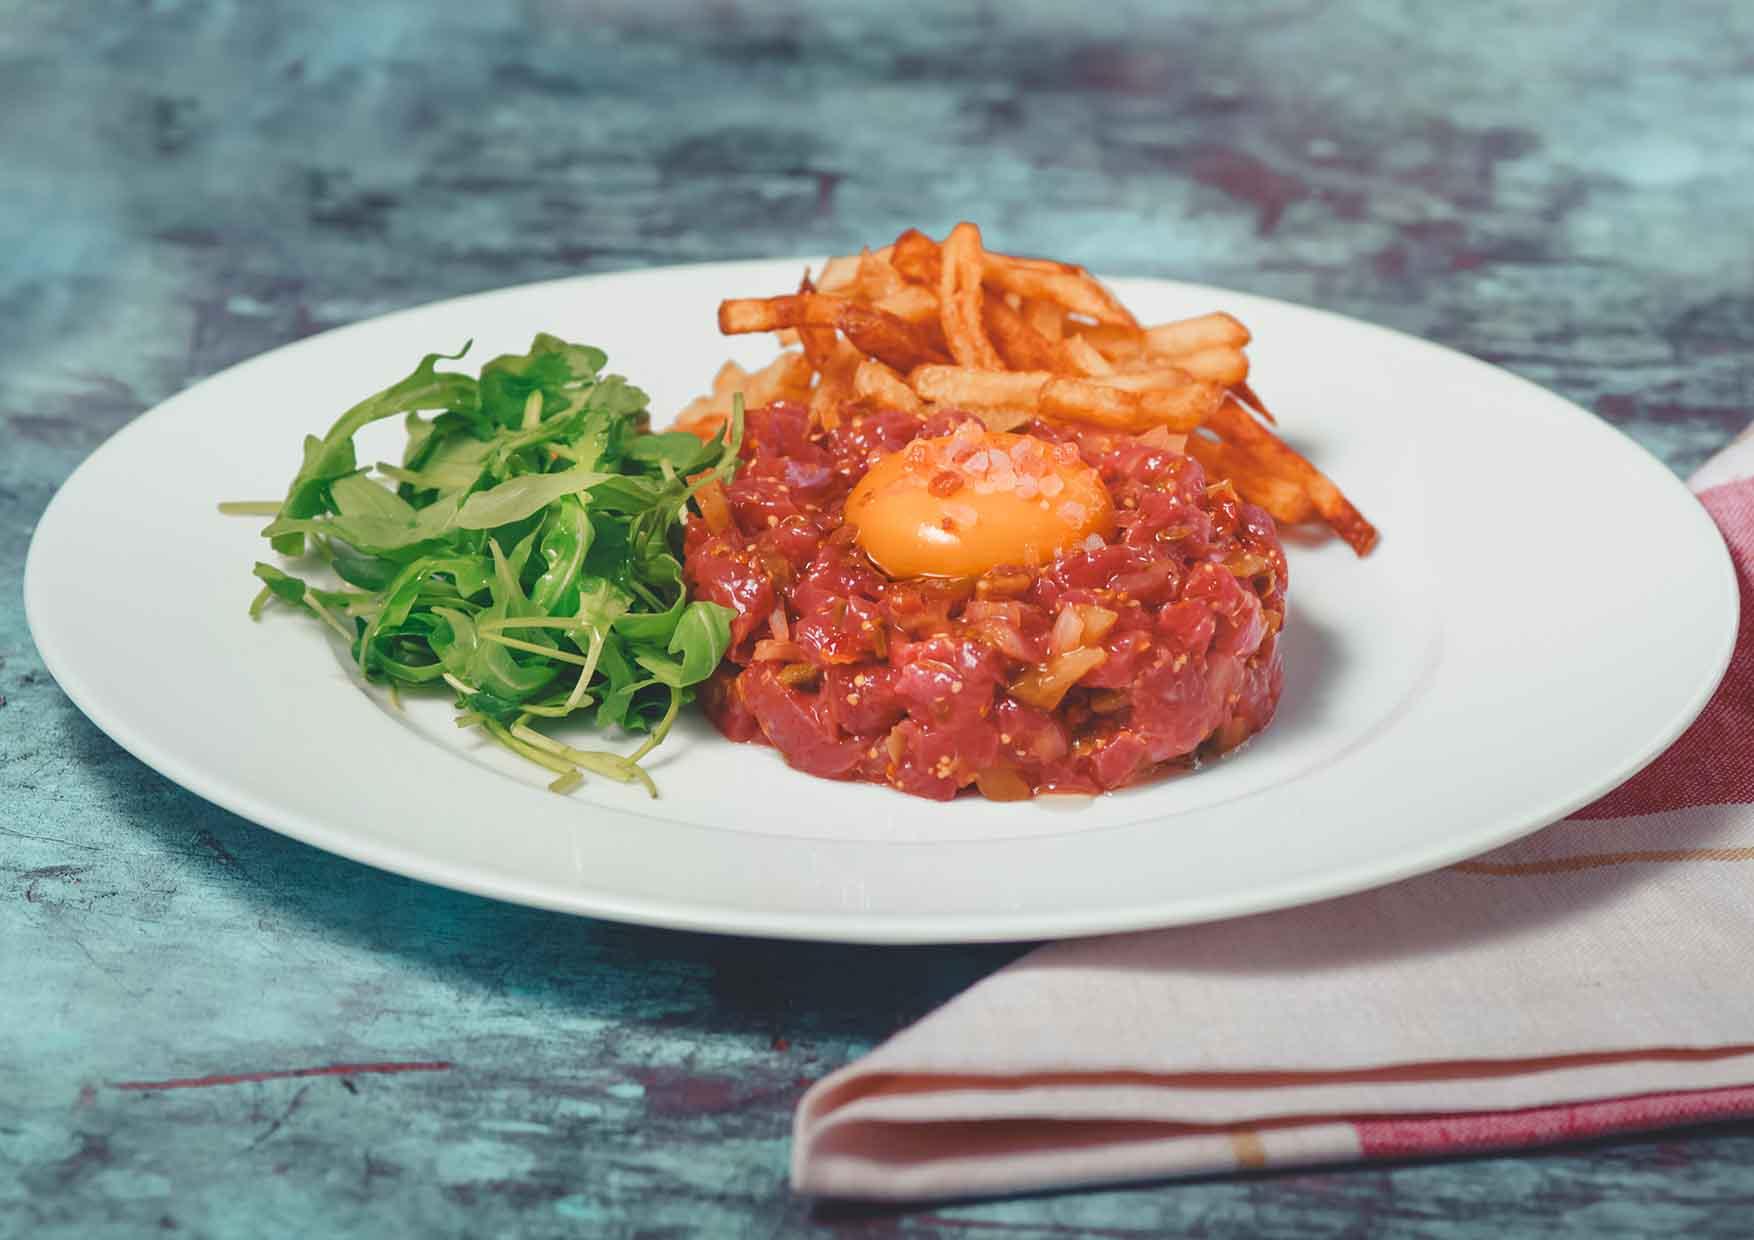 Steak Tartar - comida para llevar - Meatpacking